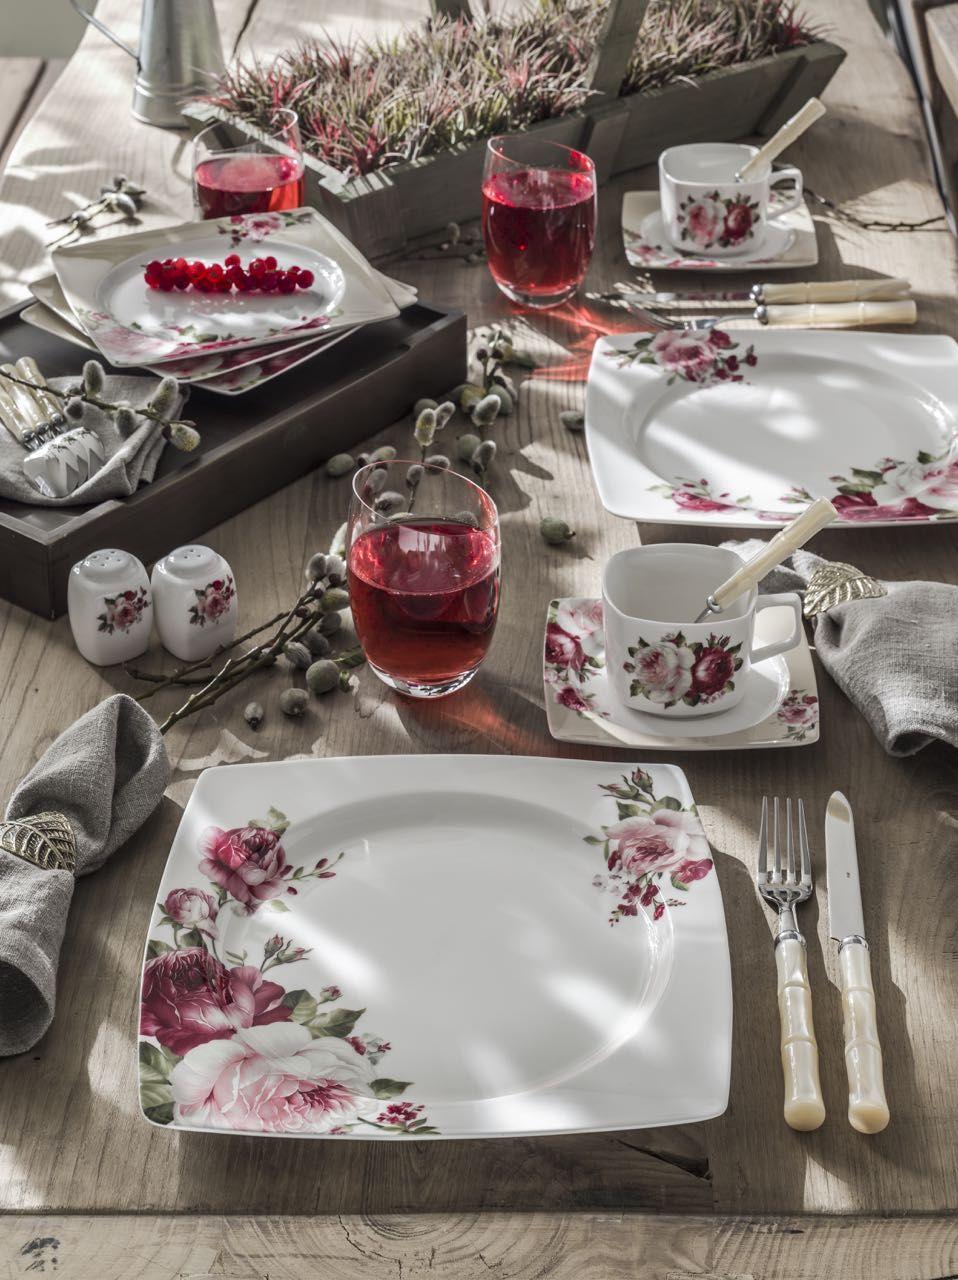 Porcelain dinner sophisticated table table settings table set dinnerware tableware & Porcelain dinner sophisticated table table settings table set ...